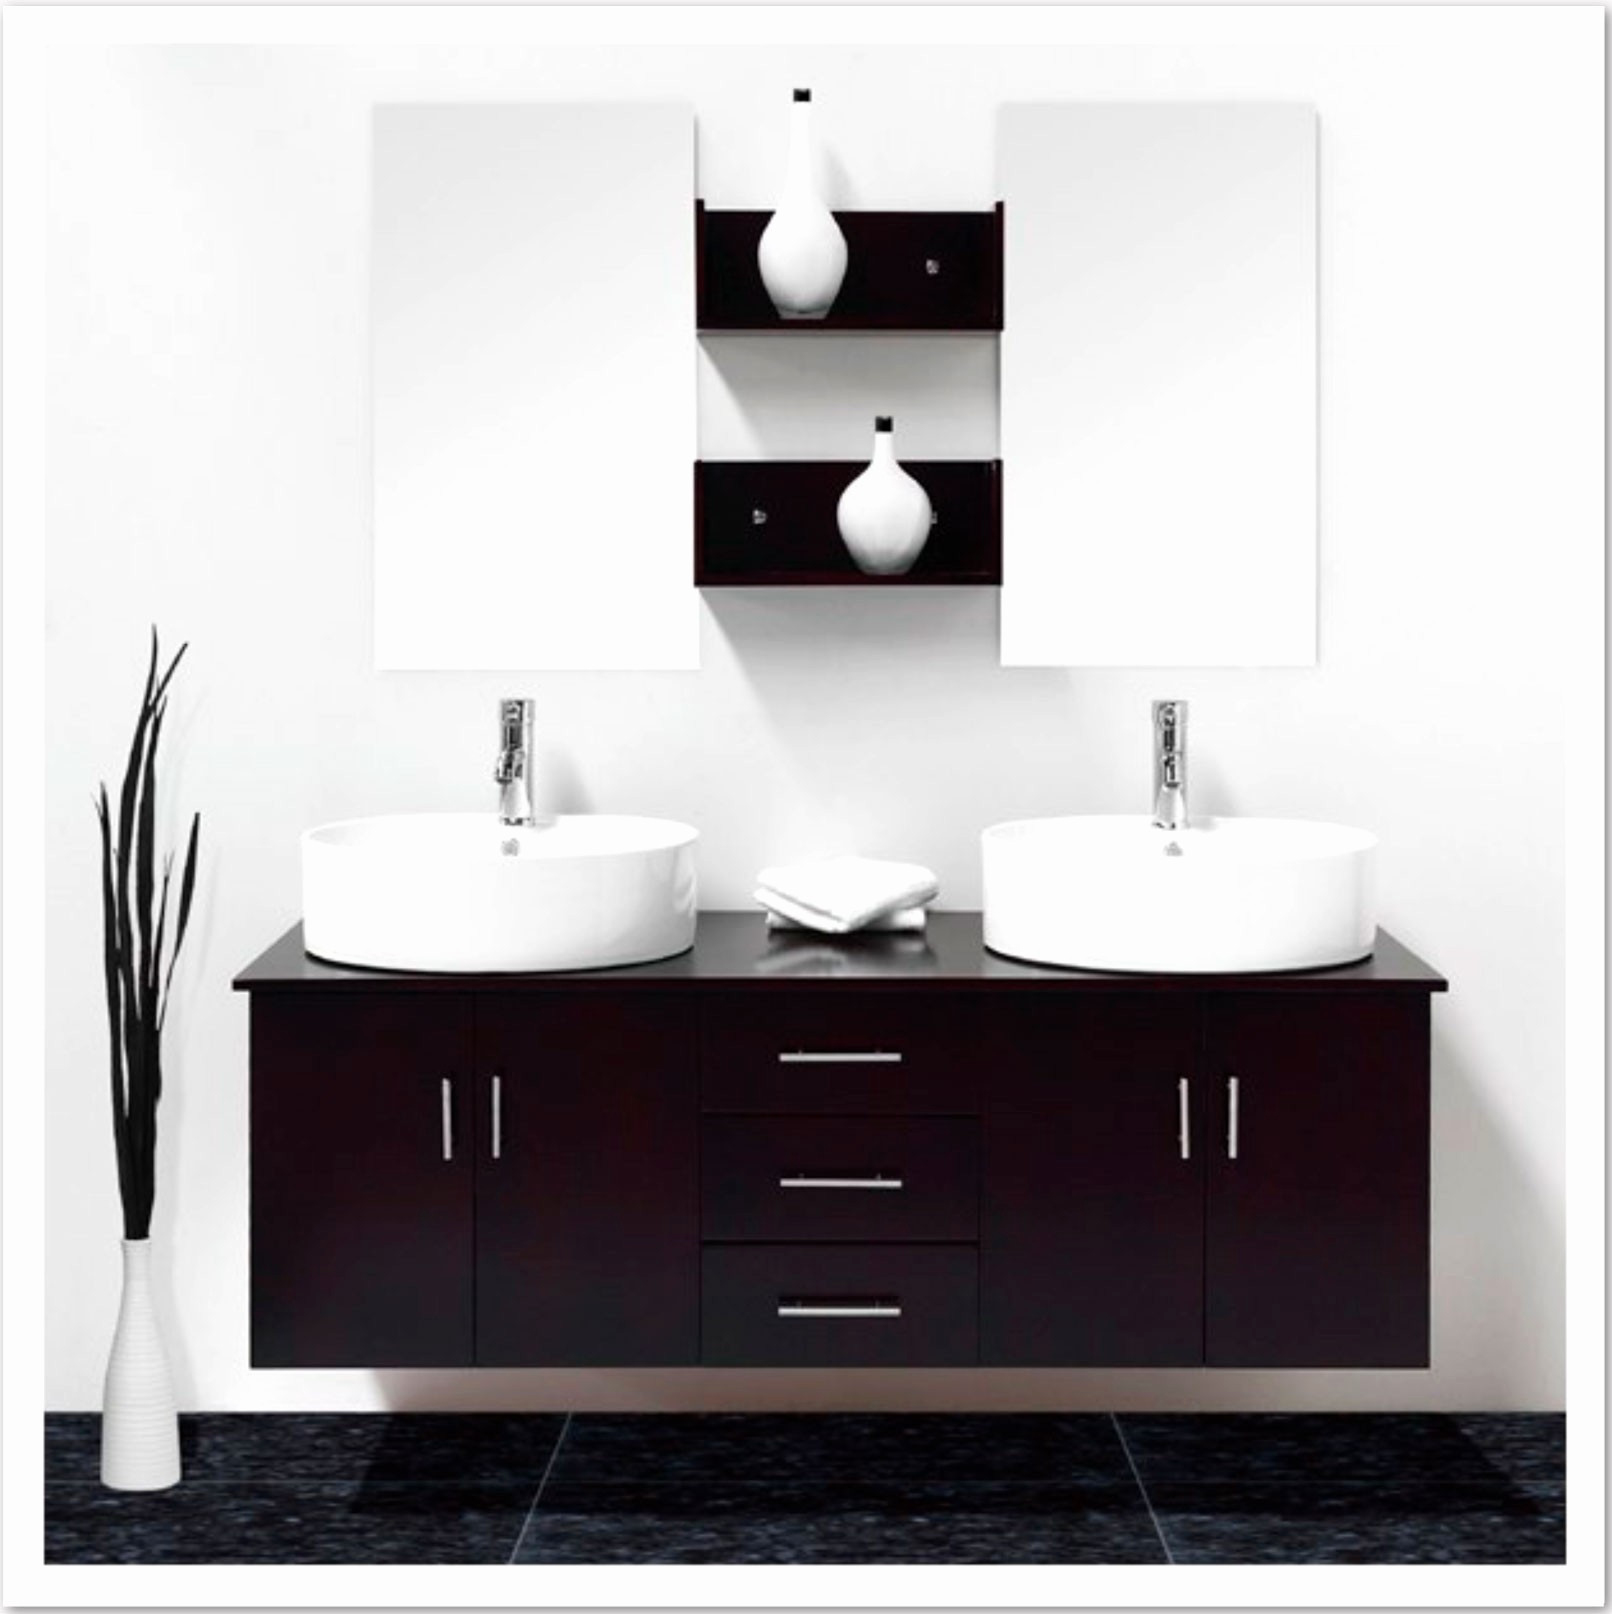 Cedeo Meuble Salle De Bain Beau Image Meuble Pour Vasque 17 De Salle Bain Sans Nouvelles Idees A Poser